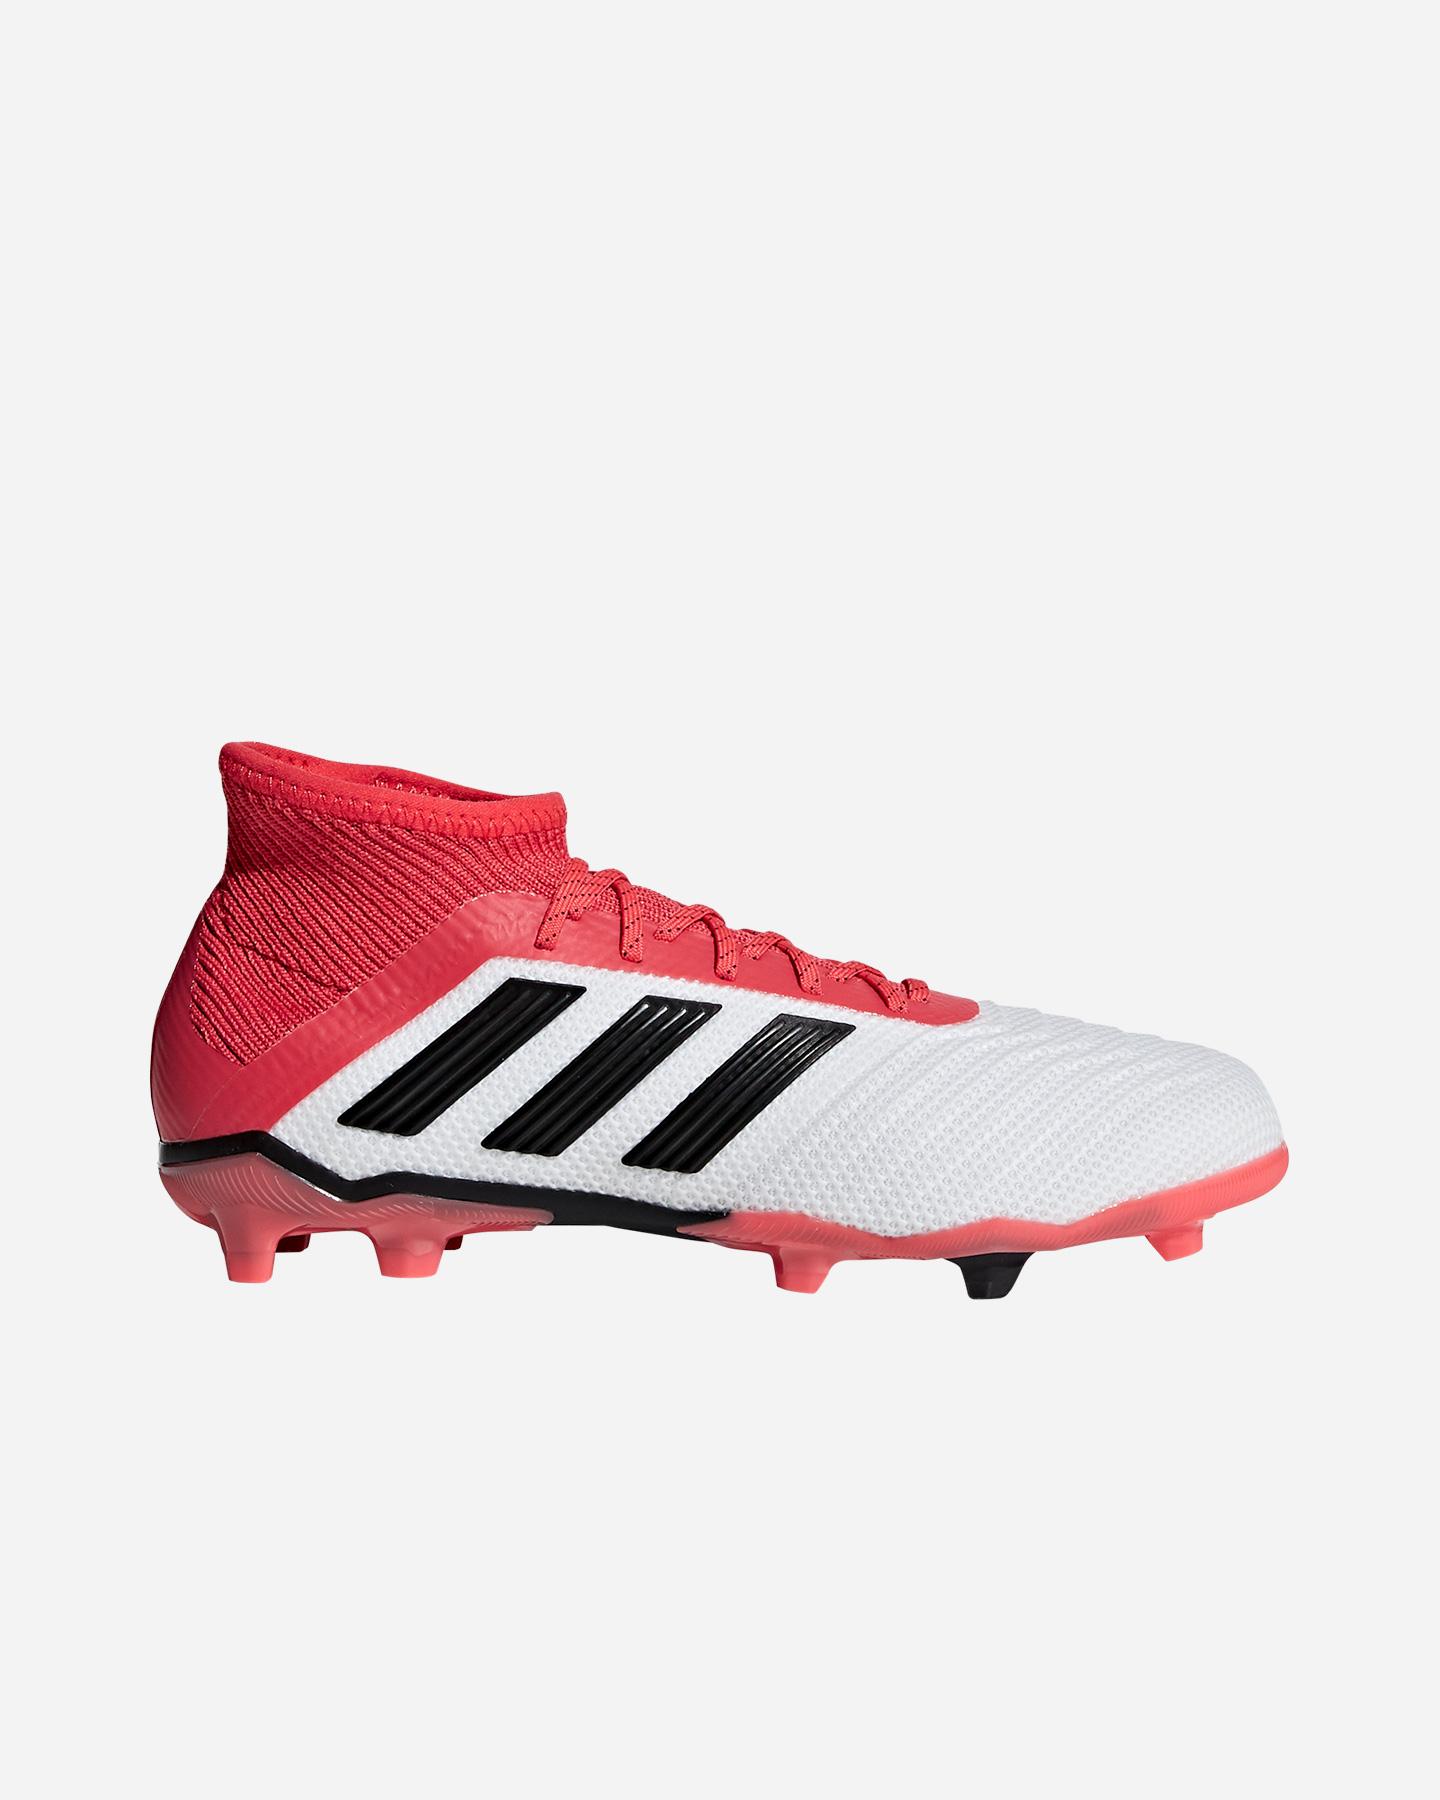 Su Sport Q8apttw Scarpe Cp8873 Predator Adidas Jr Cisalfa 1 Calcio Fg 18 Ifv6mgYb7y